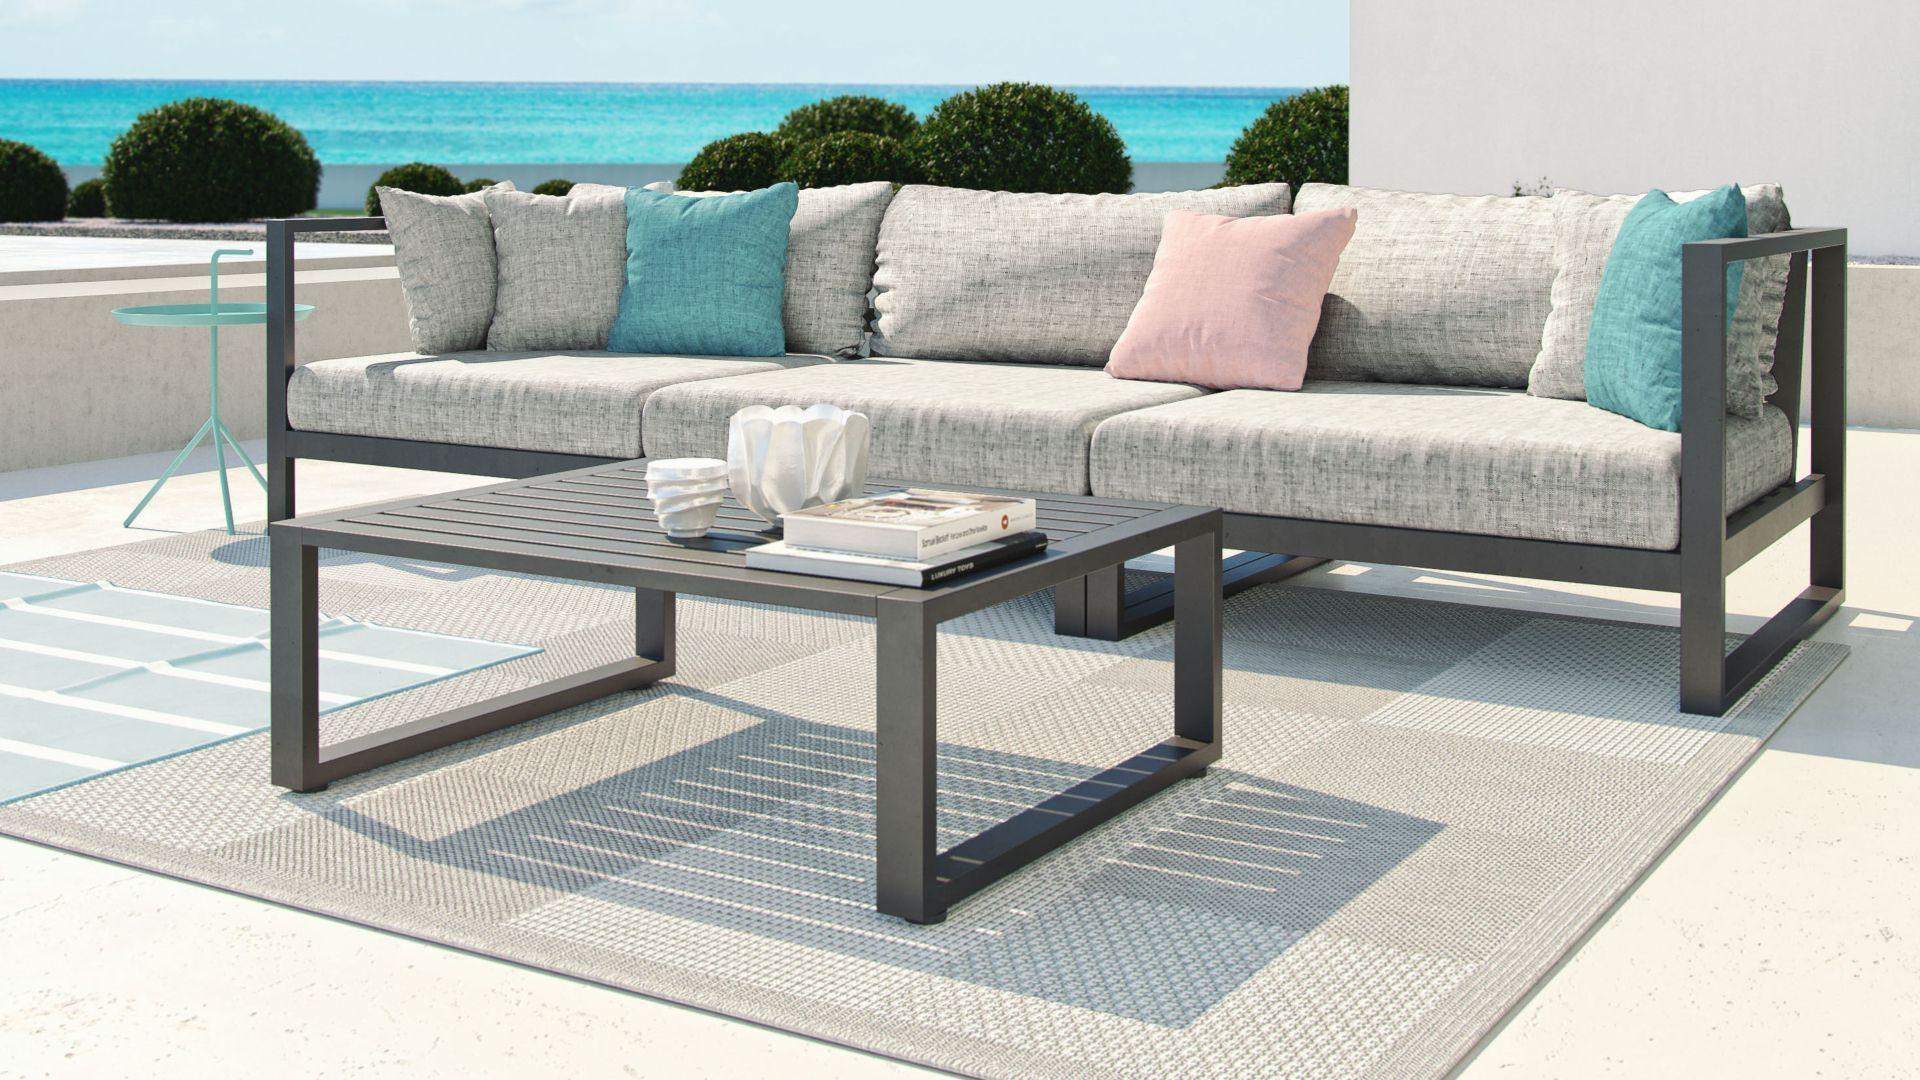 Salon De Jardin Matteo S Furniture Outdoor Decor Aluminium Garden Furniture